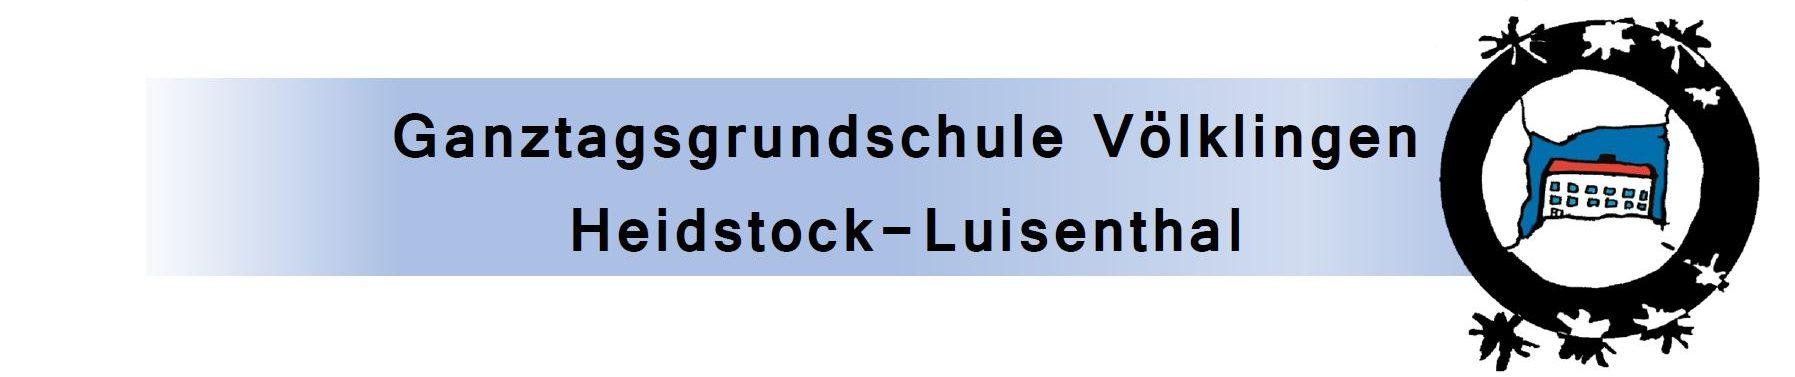 Ganztagsgrundschule VK/Heidstock-Luisenthal